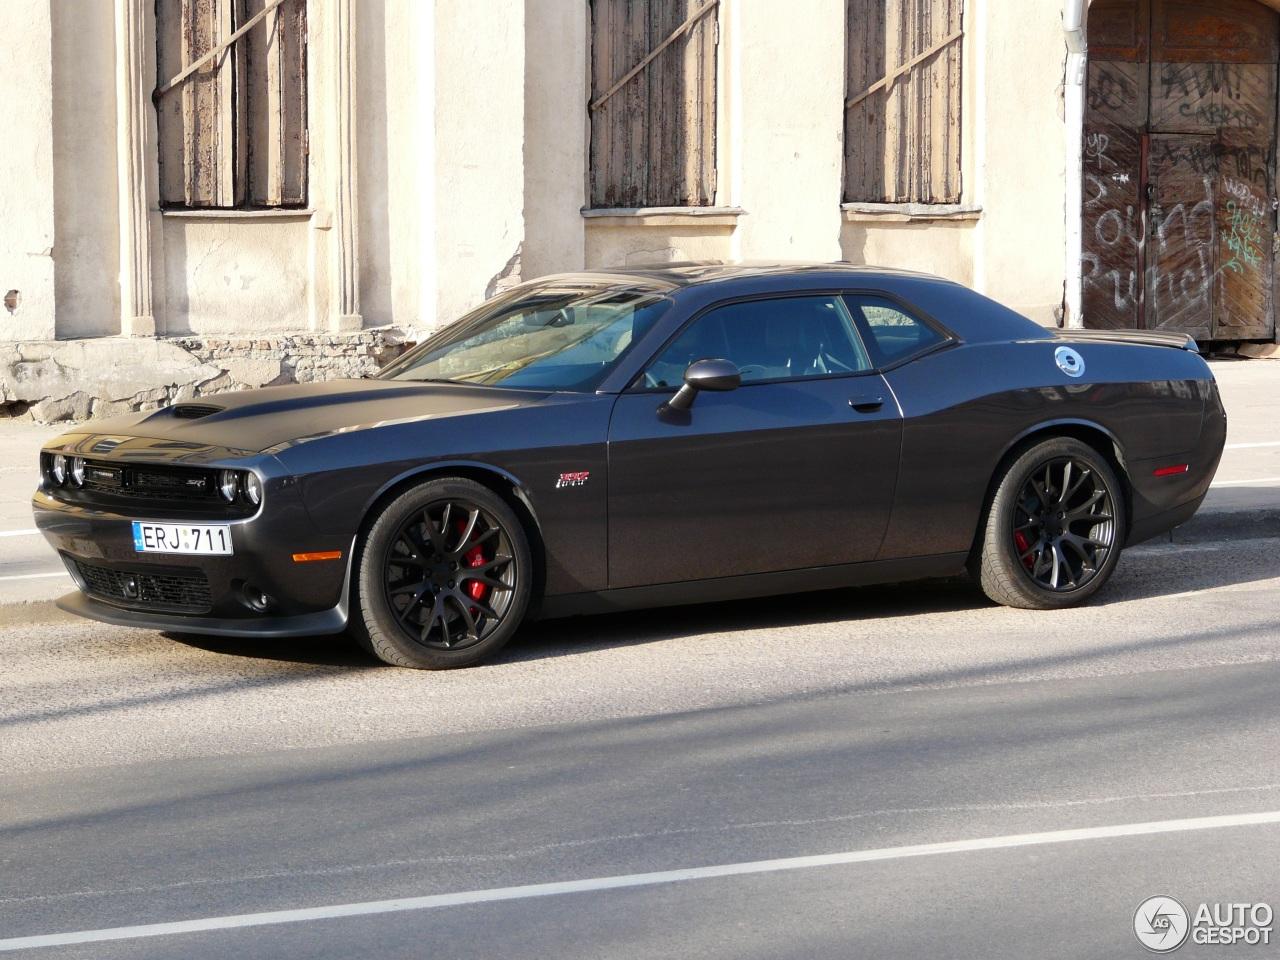 Dodge Challenger Srt 8 392 2015 27 May 2016 Autogespot